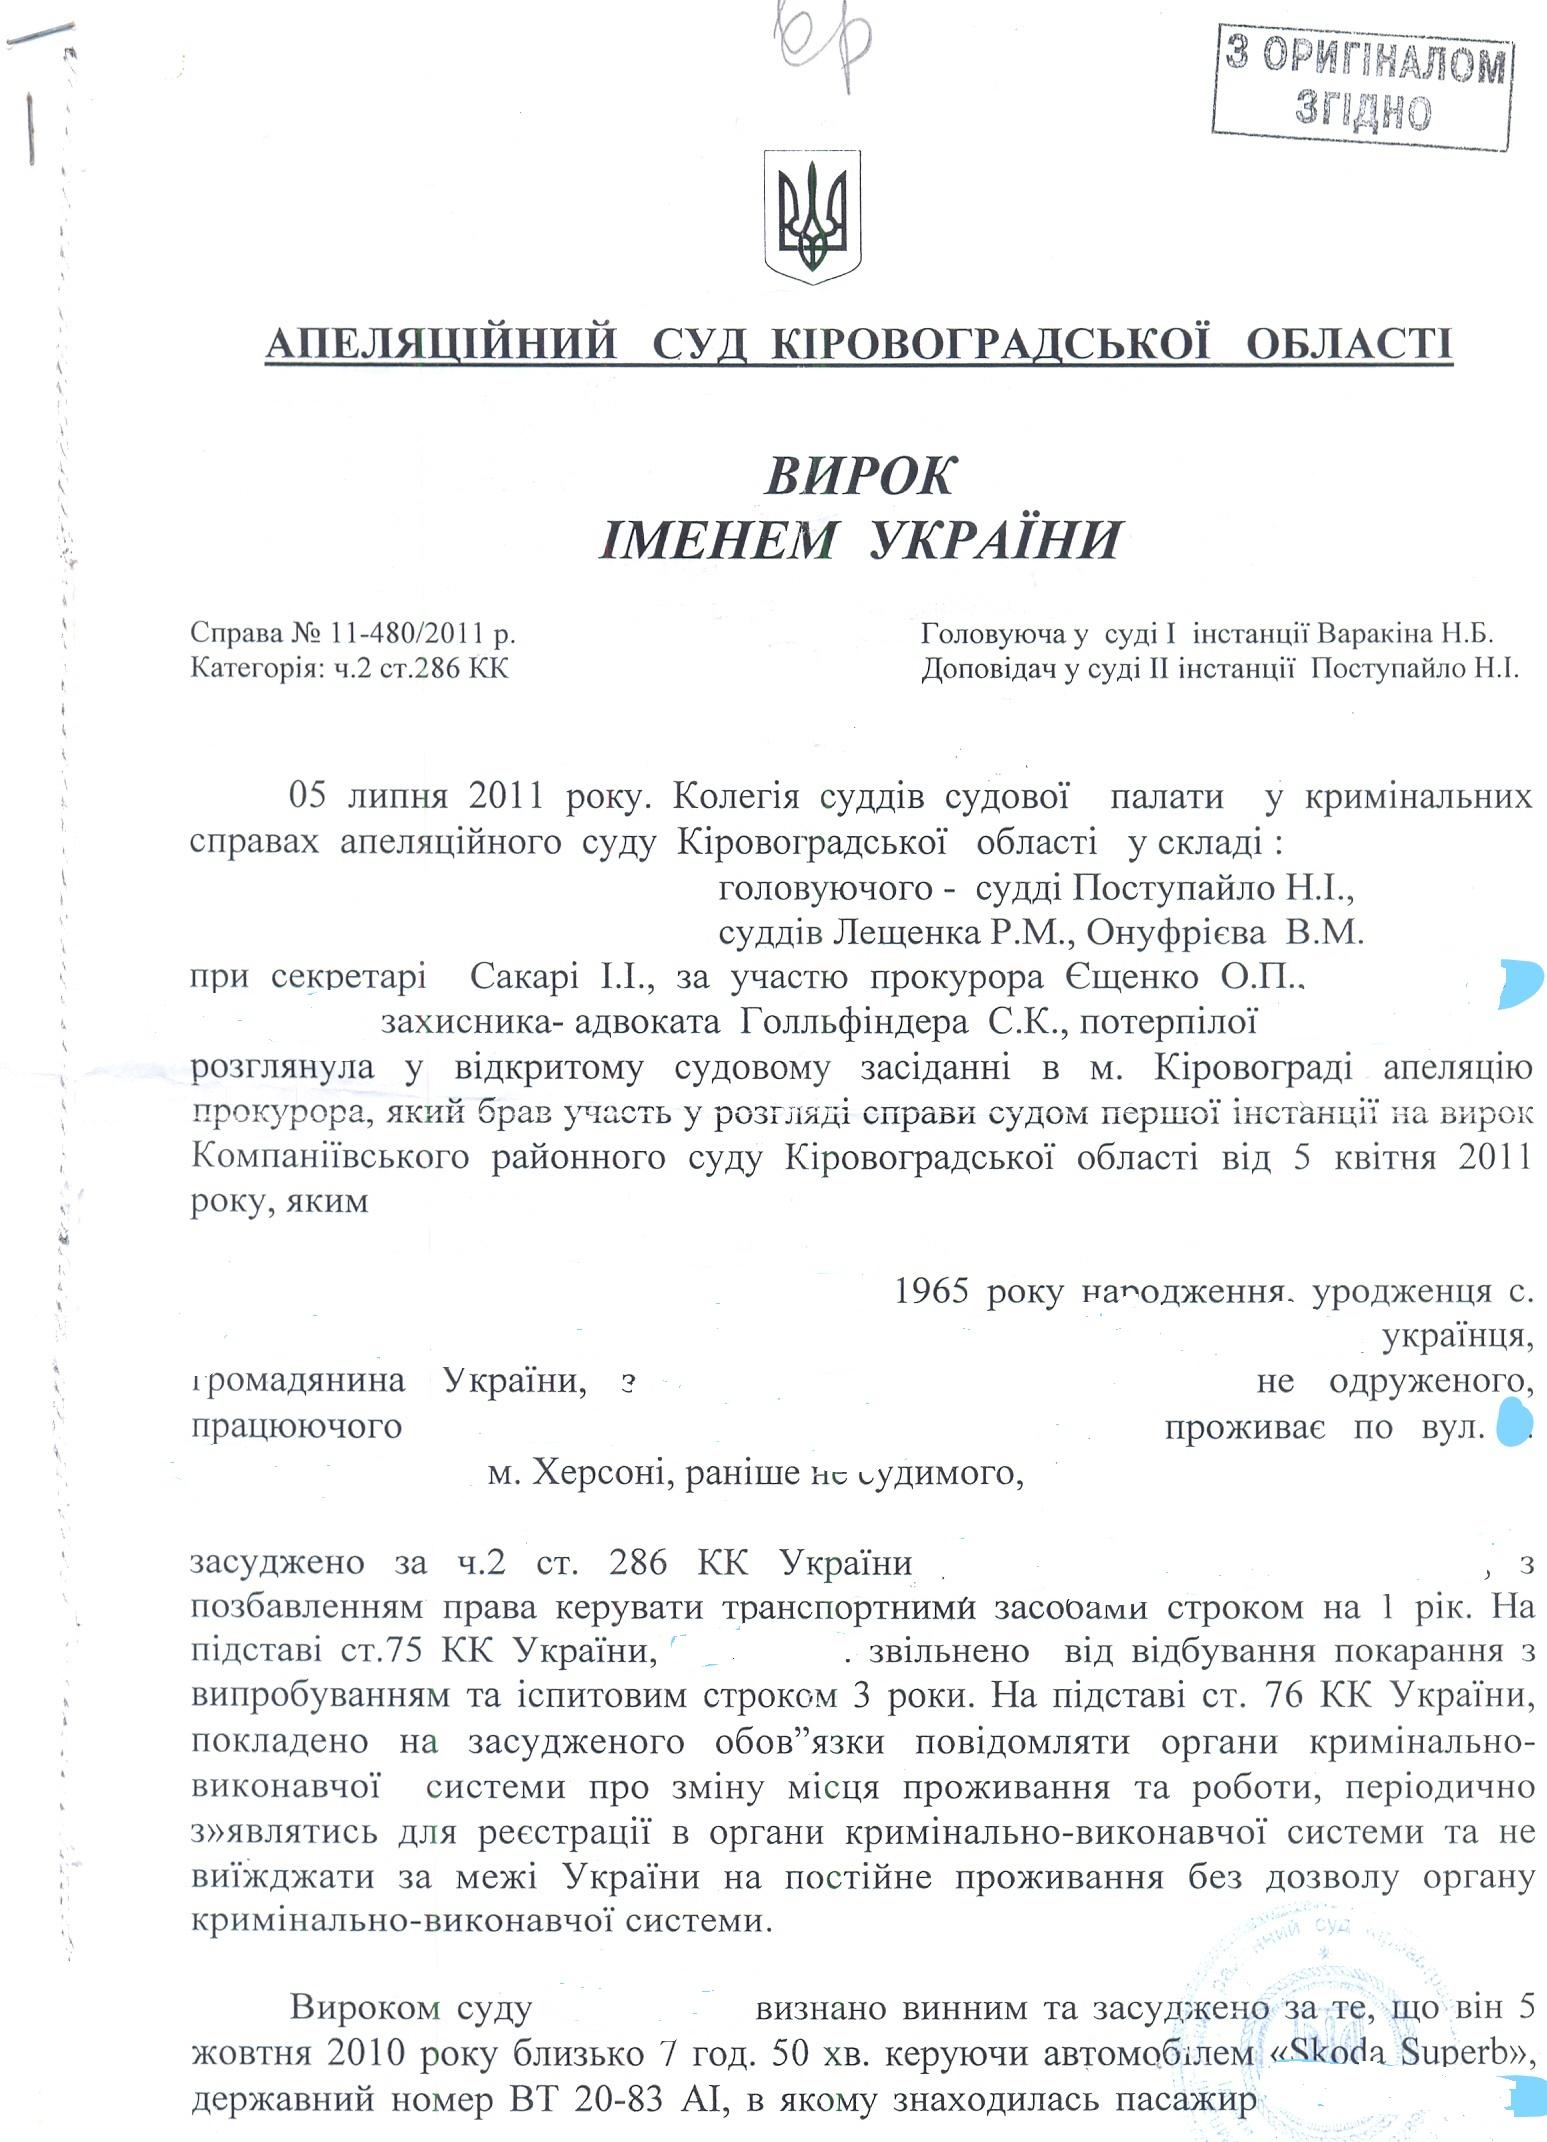 image http://forum.setam.net.ua/assets/images/578-pIMSxrNi2rogBYrb.jpeg